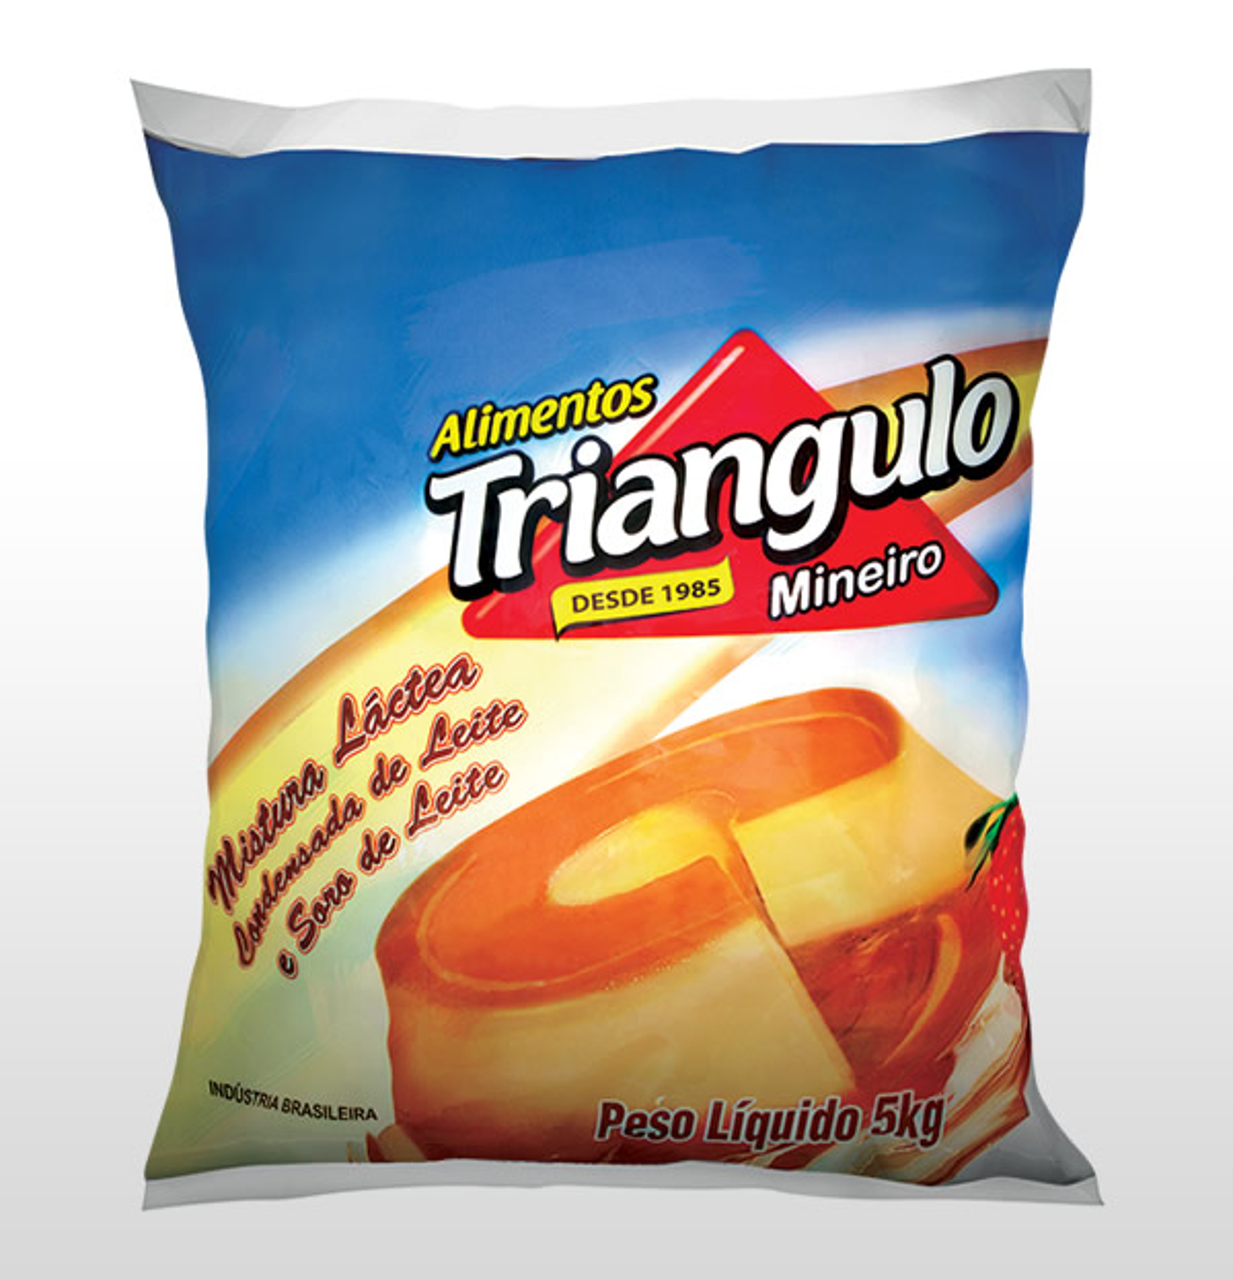 LEITE CONDEN.TRIANGULO MINEIRO BAG 5K